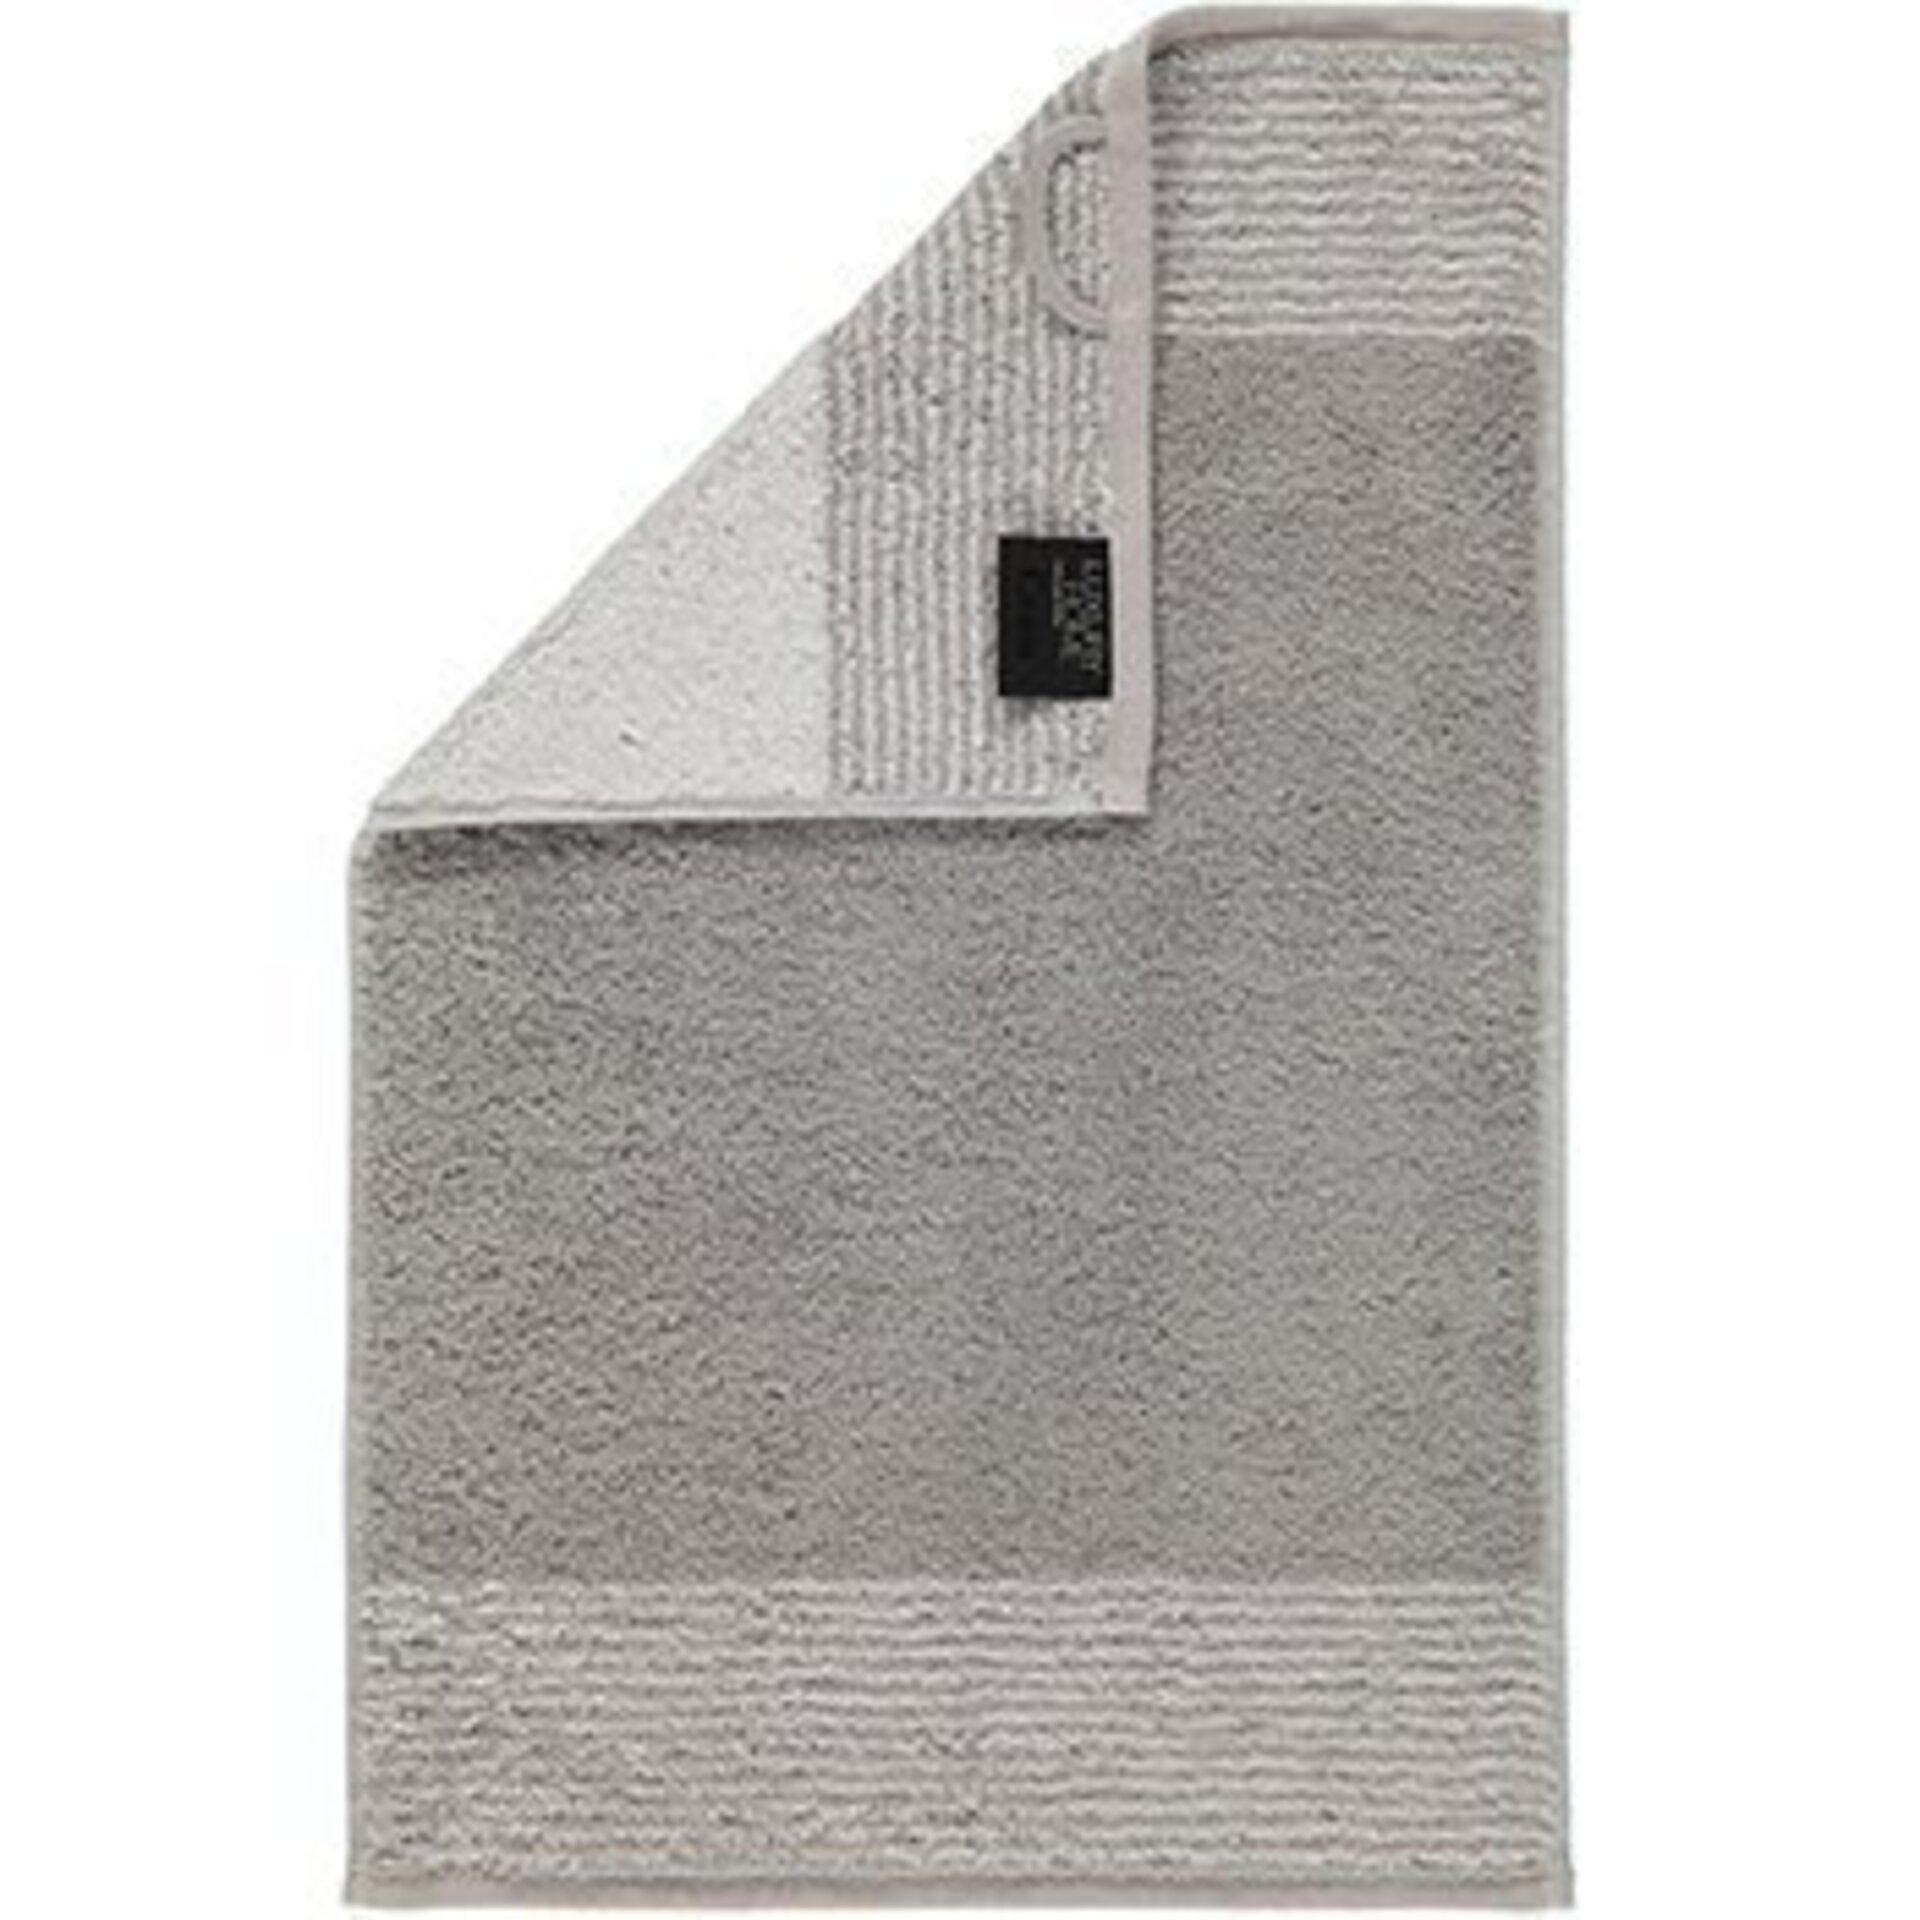 Gästetuch Cawö Textil grau 30 x 50 cm